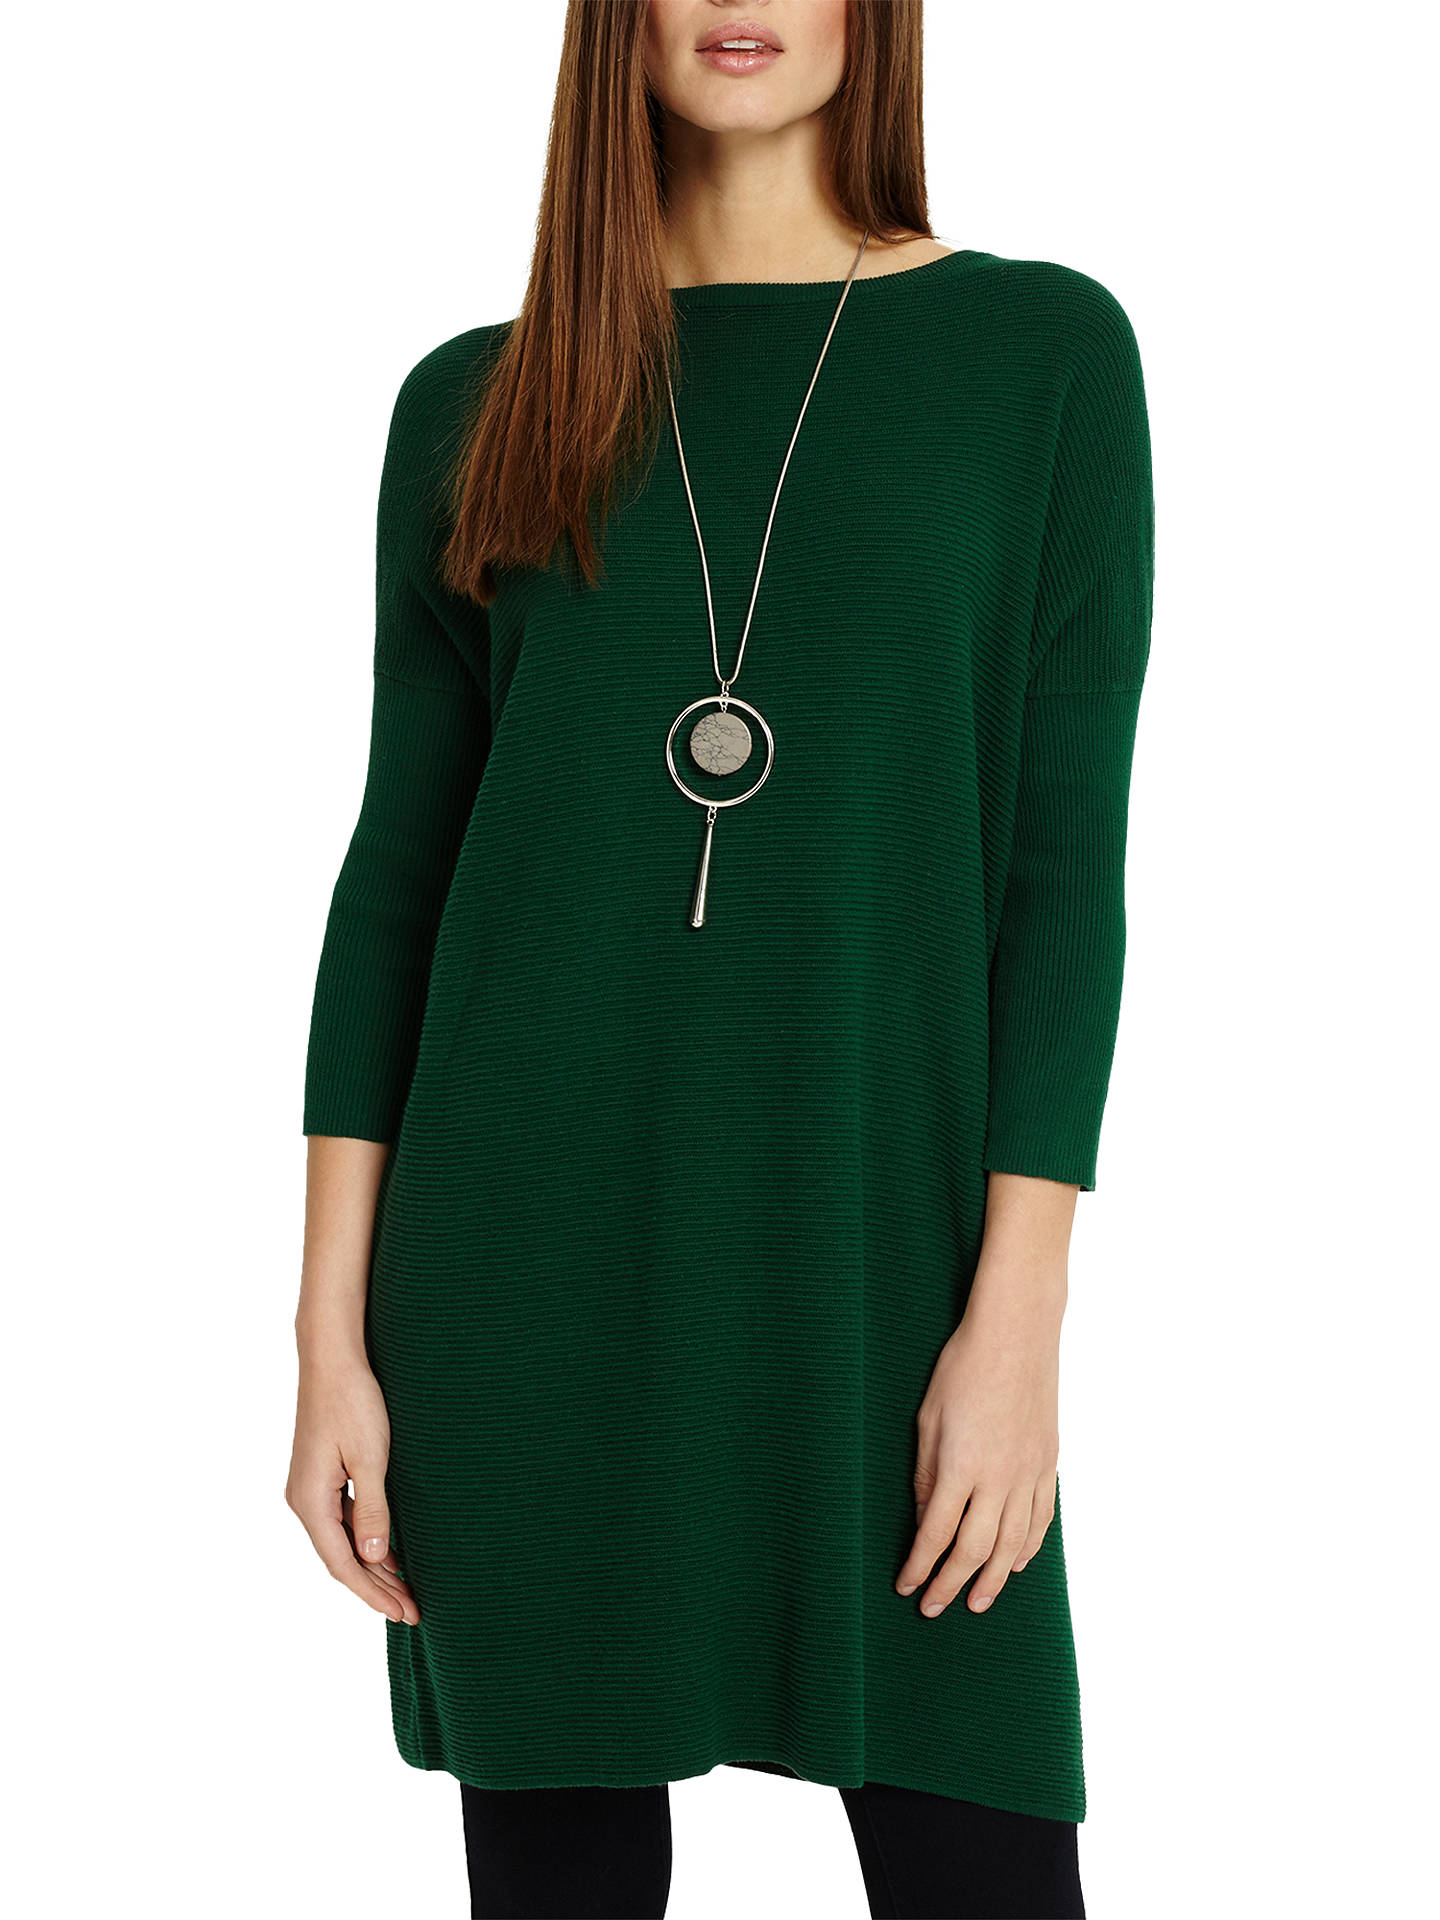 2d9531422d0d7b Buy Phase Eight Tiberia Ripple Stitch Tunic Dress, Clover Green, S Online  at johnlewis ...